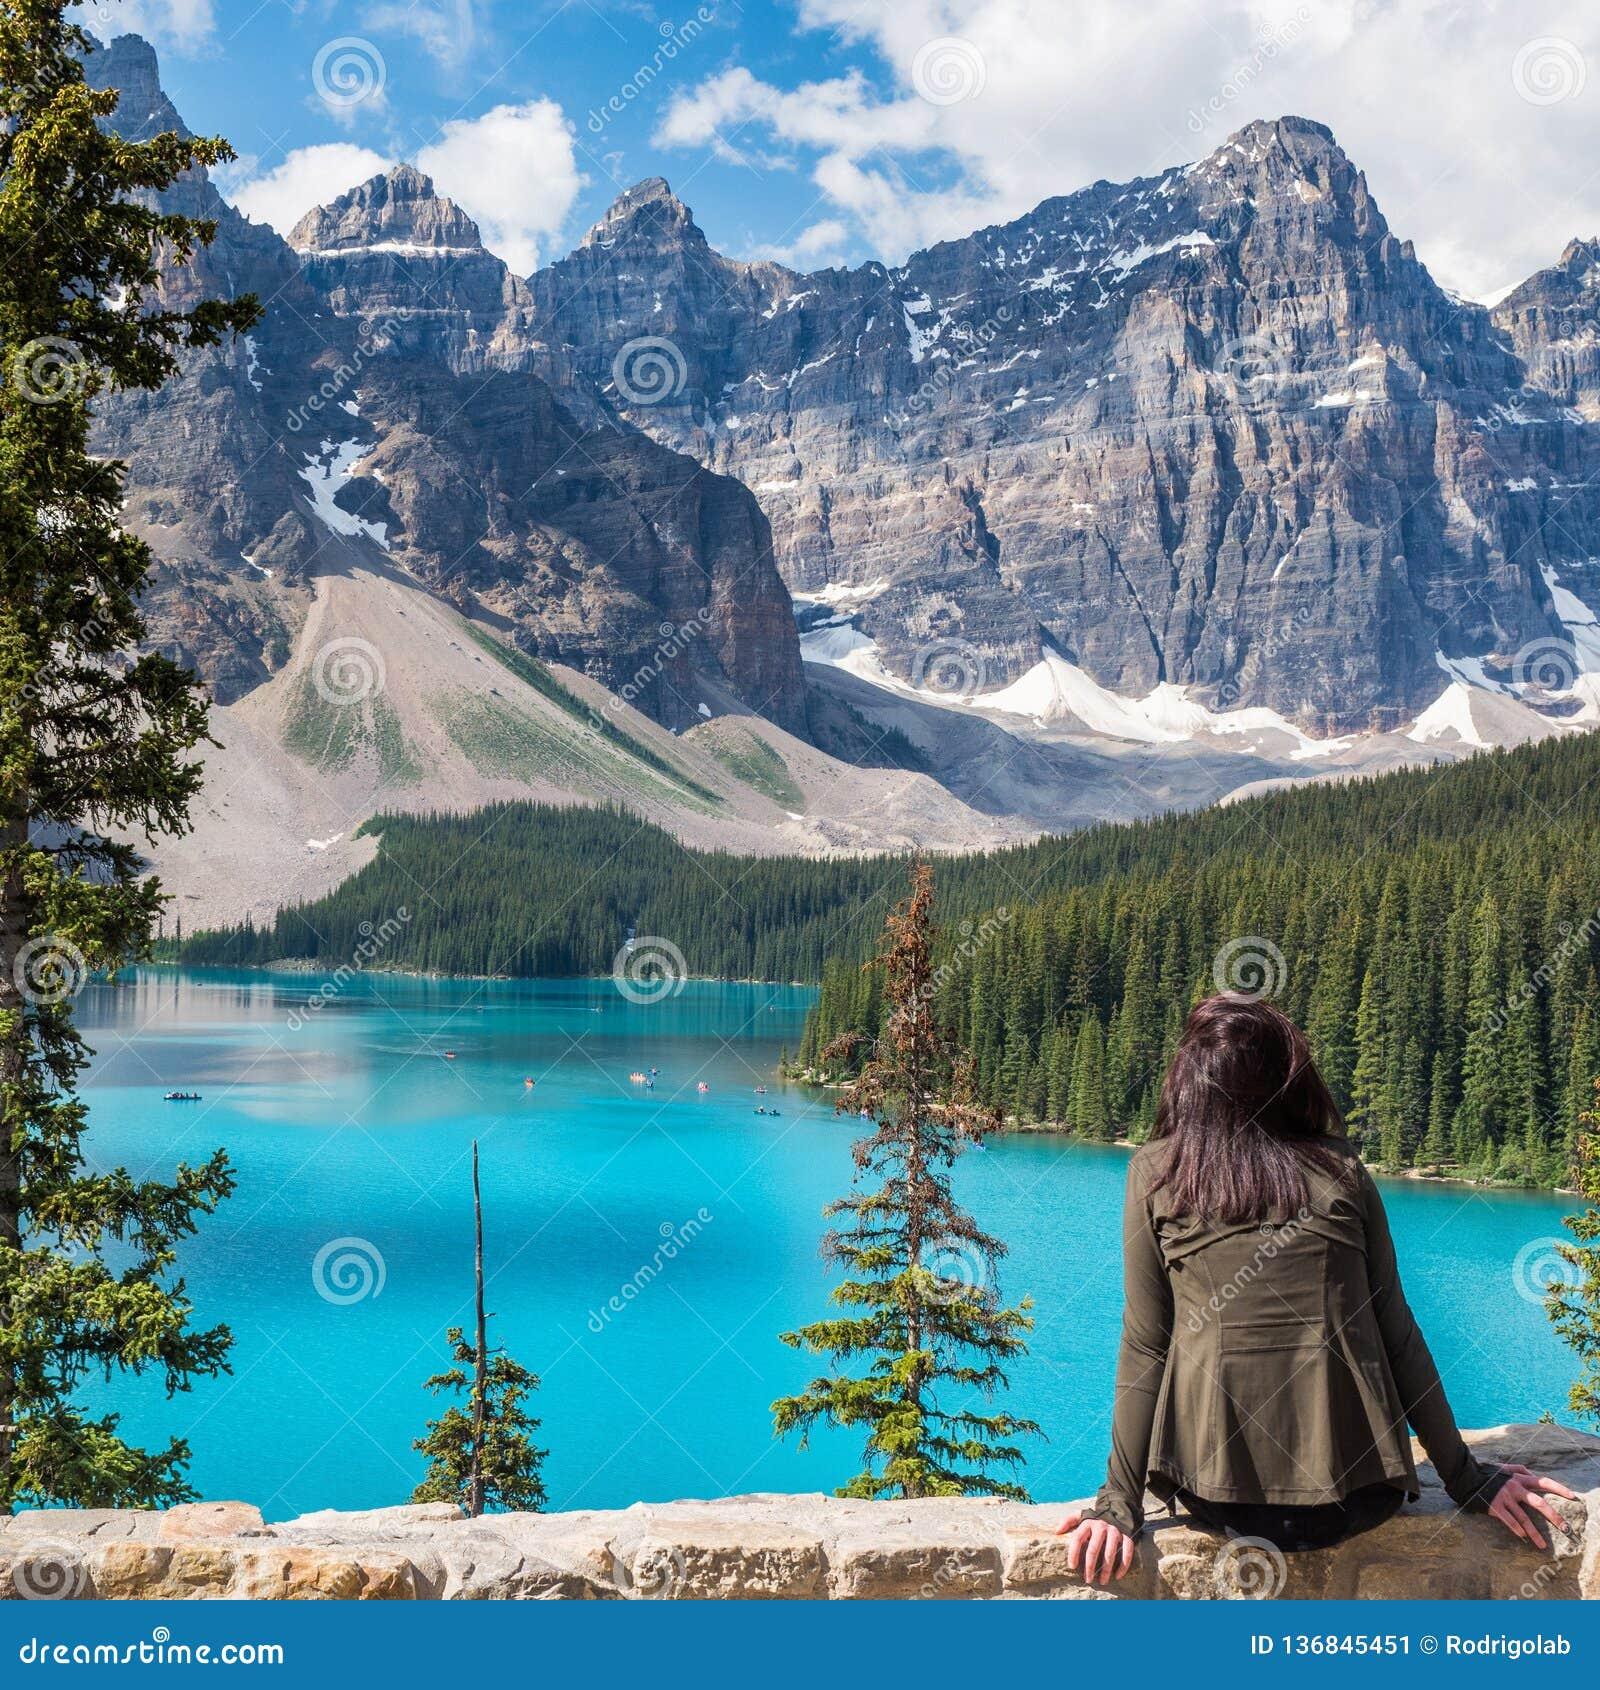 Tourist At Moraine Lake In Banff National Park Alberta